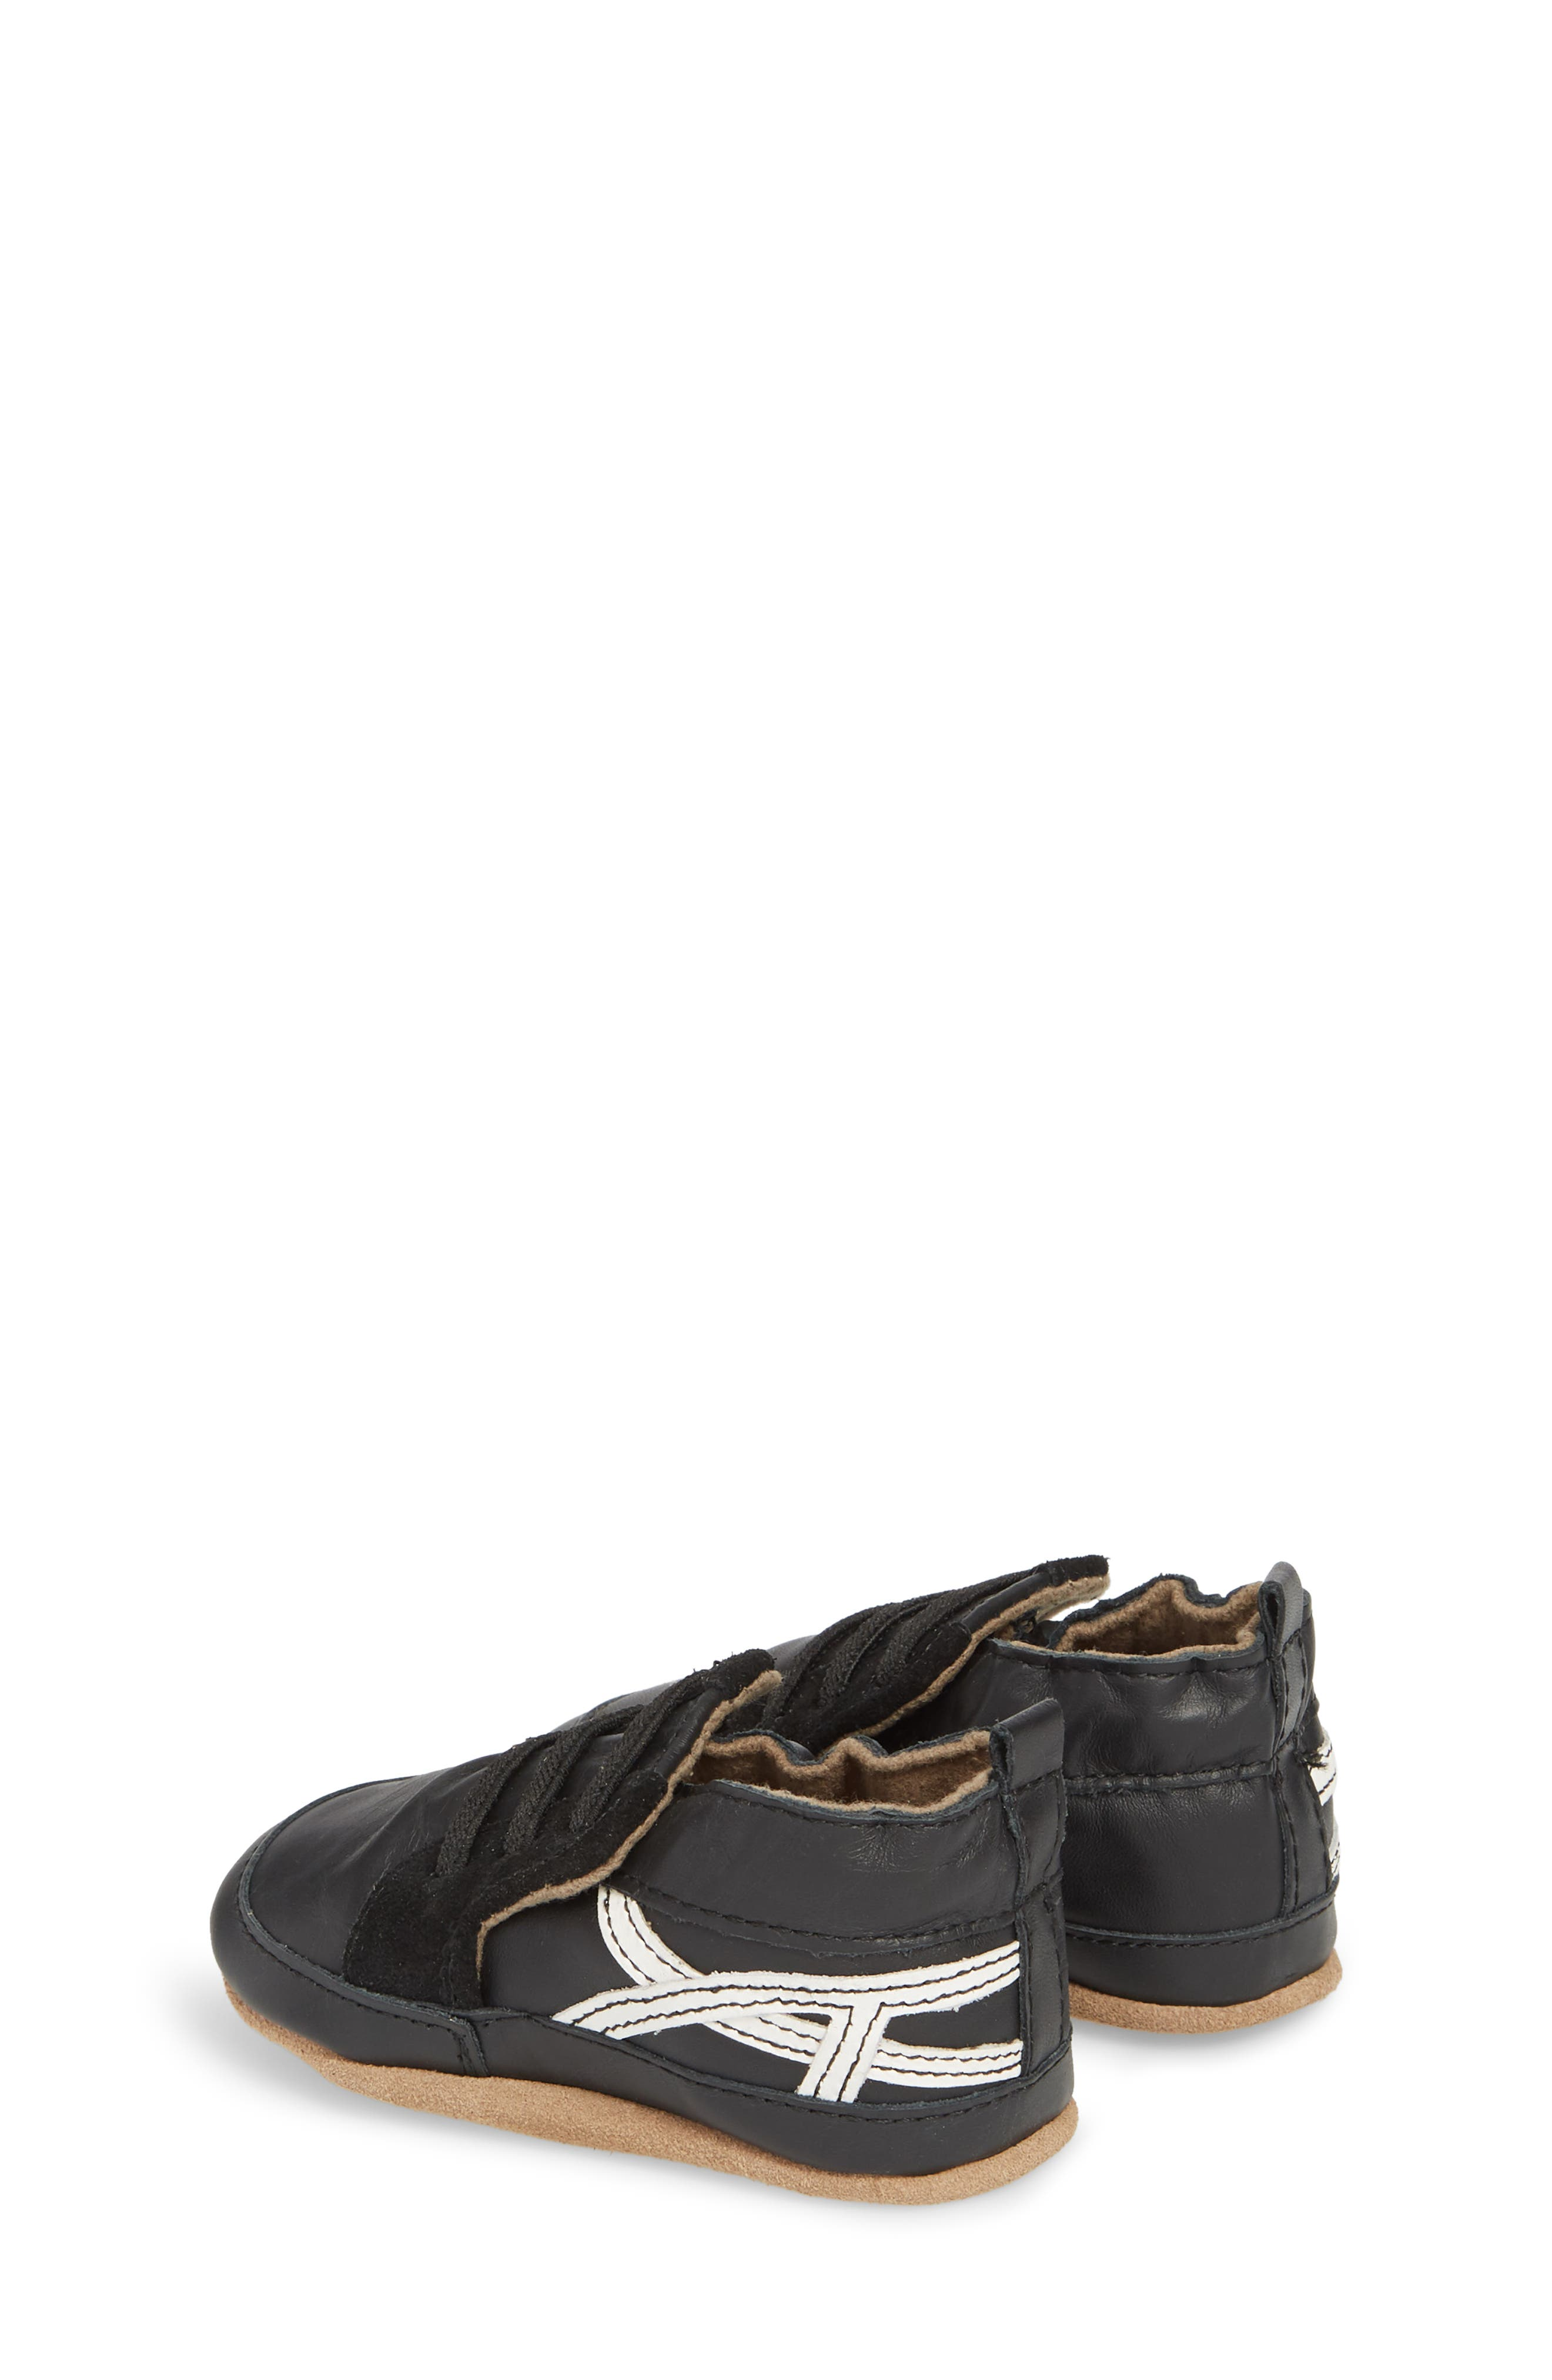 Super Sporty Sneaker Crib Shoe,                             Alternate thumbnail 2, color,                             BLACK